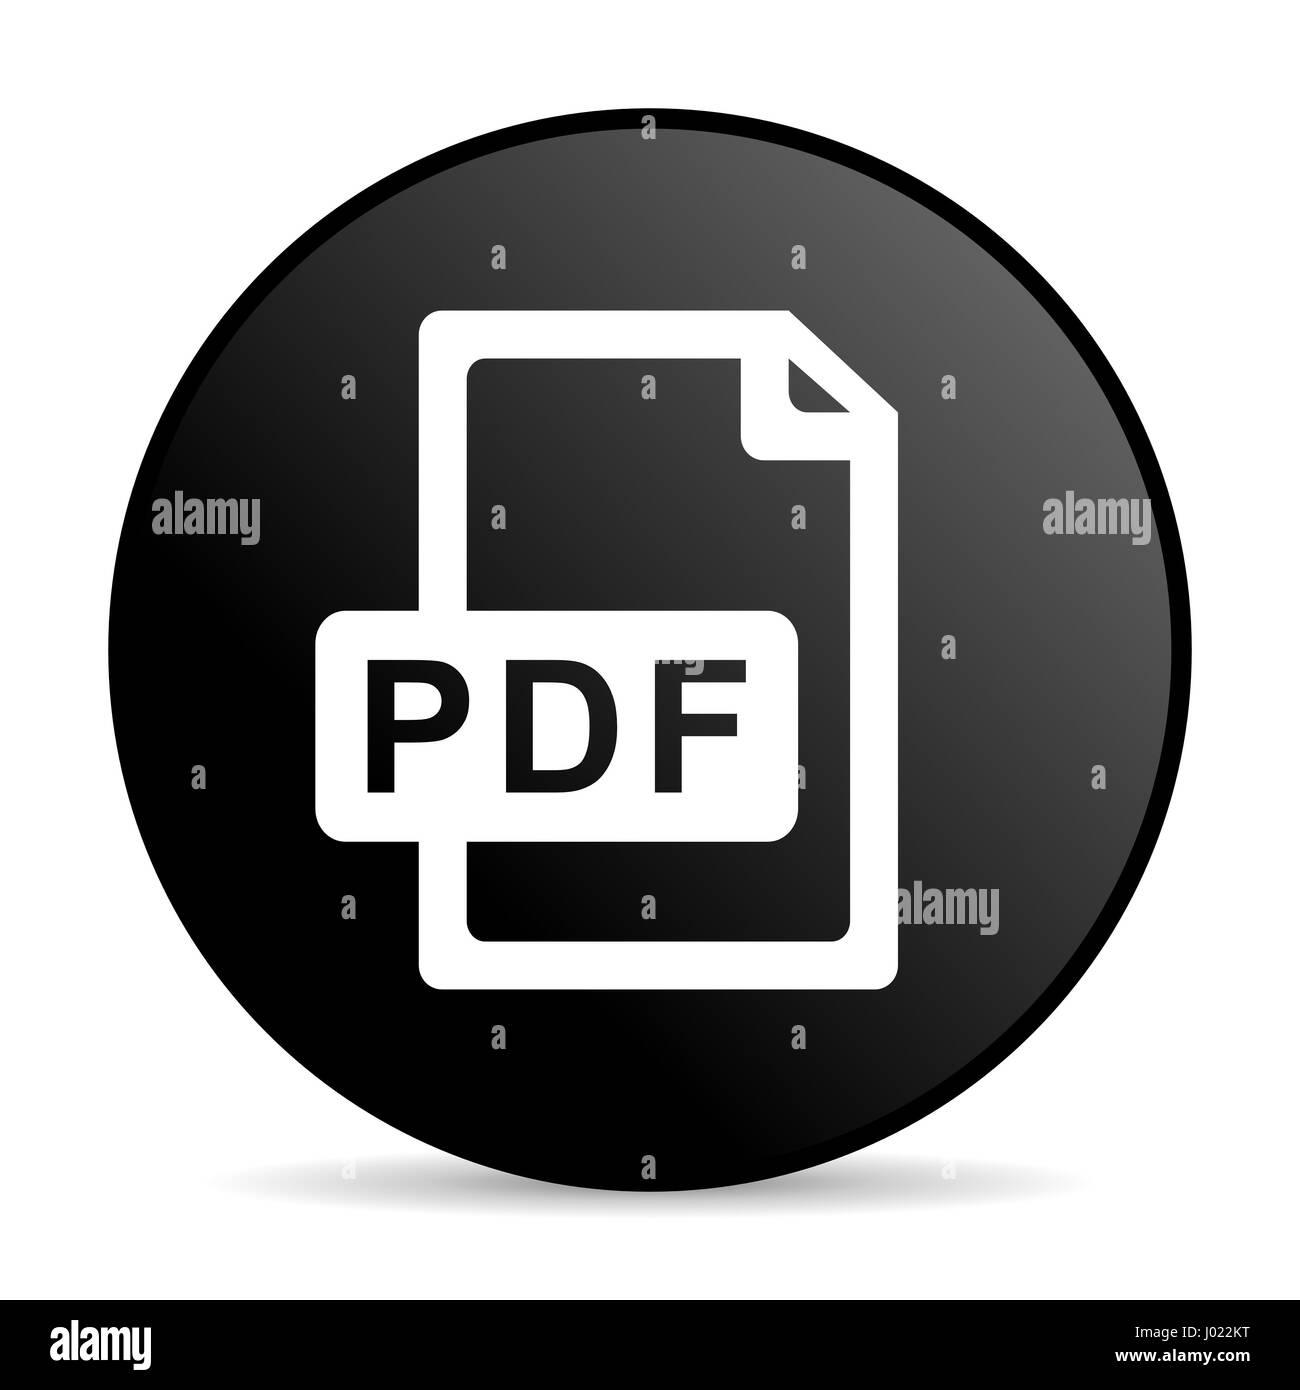 Pdf file black color web design round internet icon on white background. - Stock Image